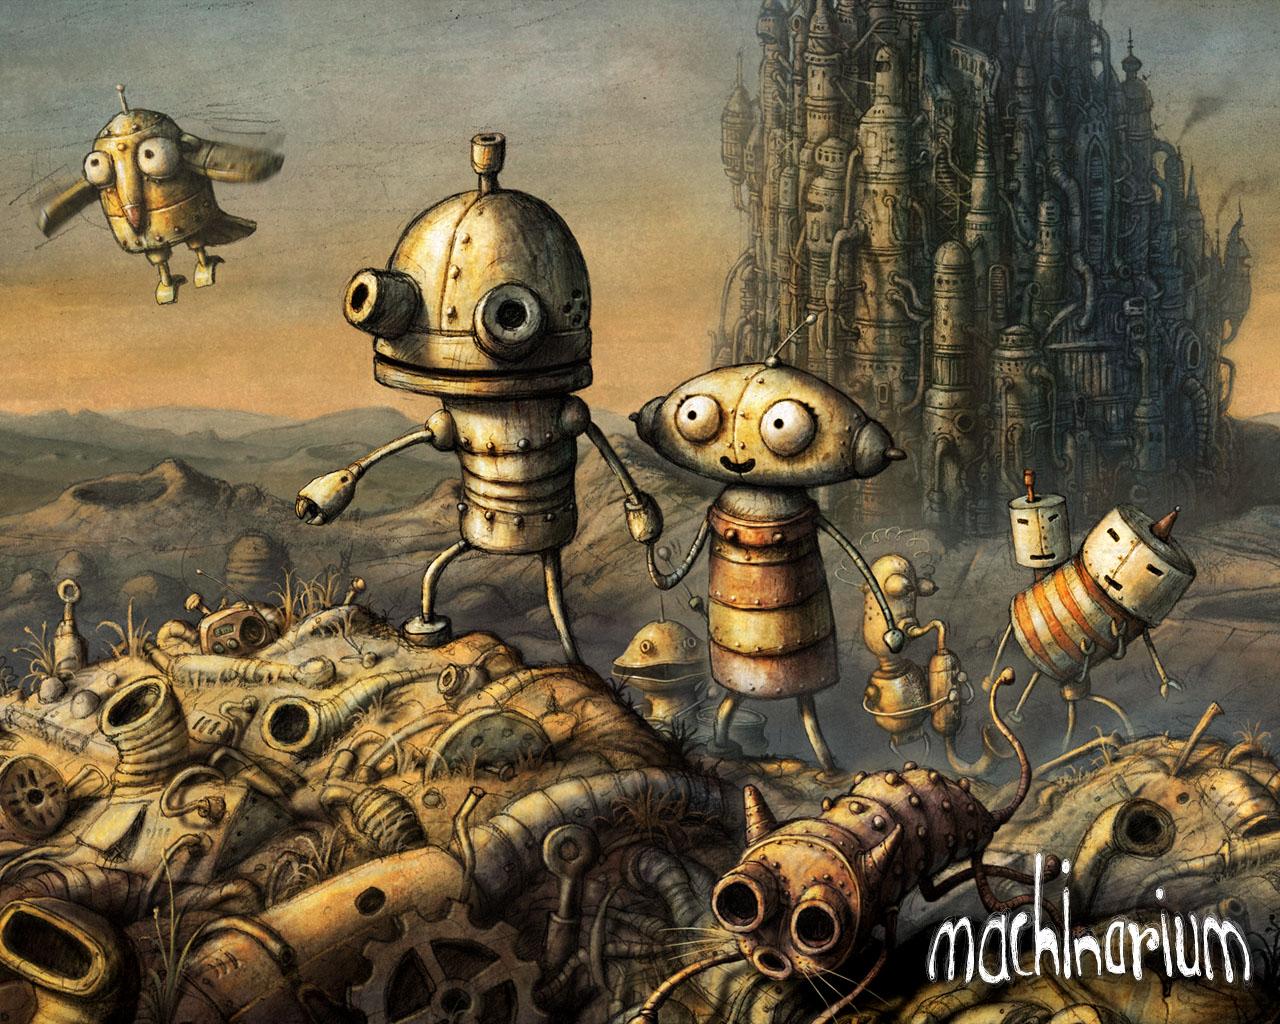 Top 5 PC Indie Game Wallpapers FPSXGames 1280x1024